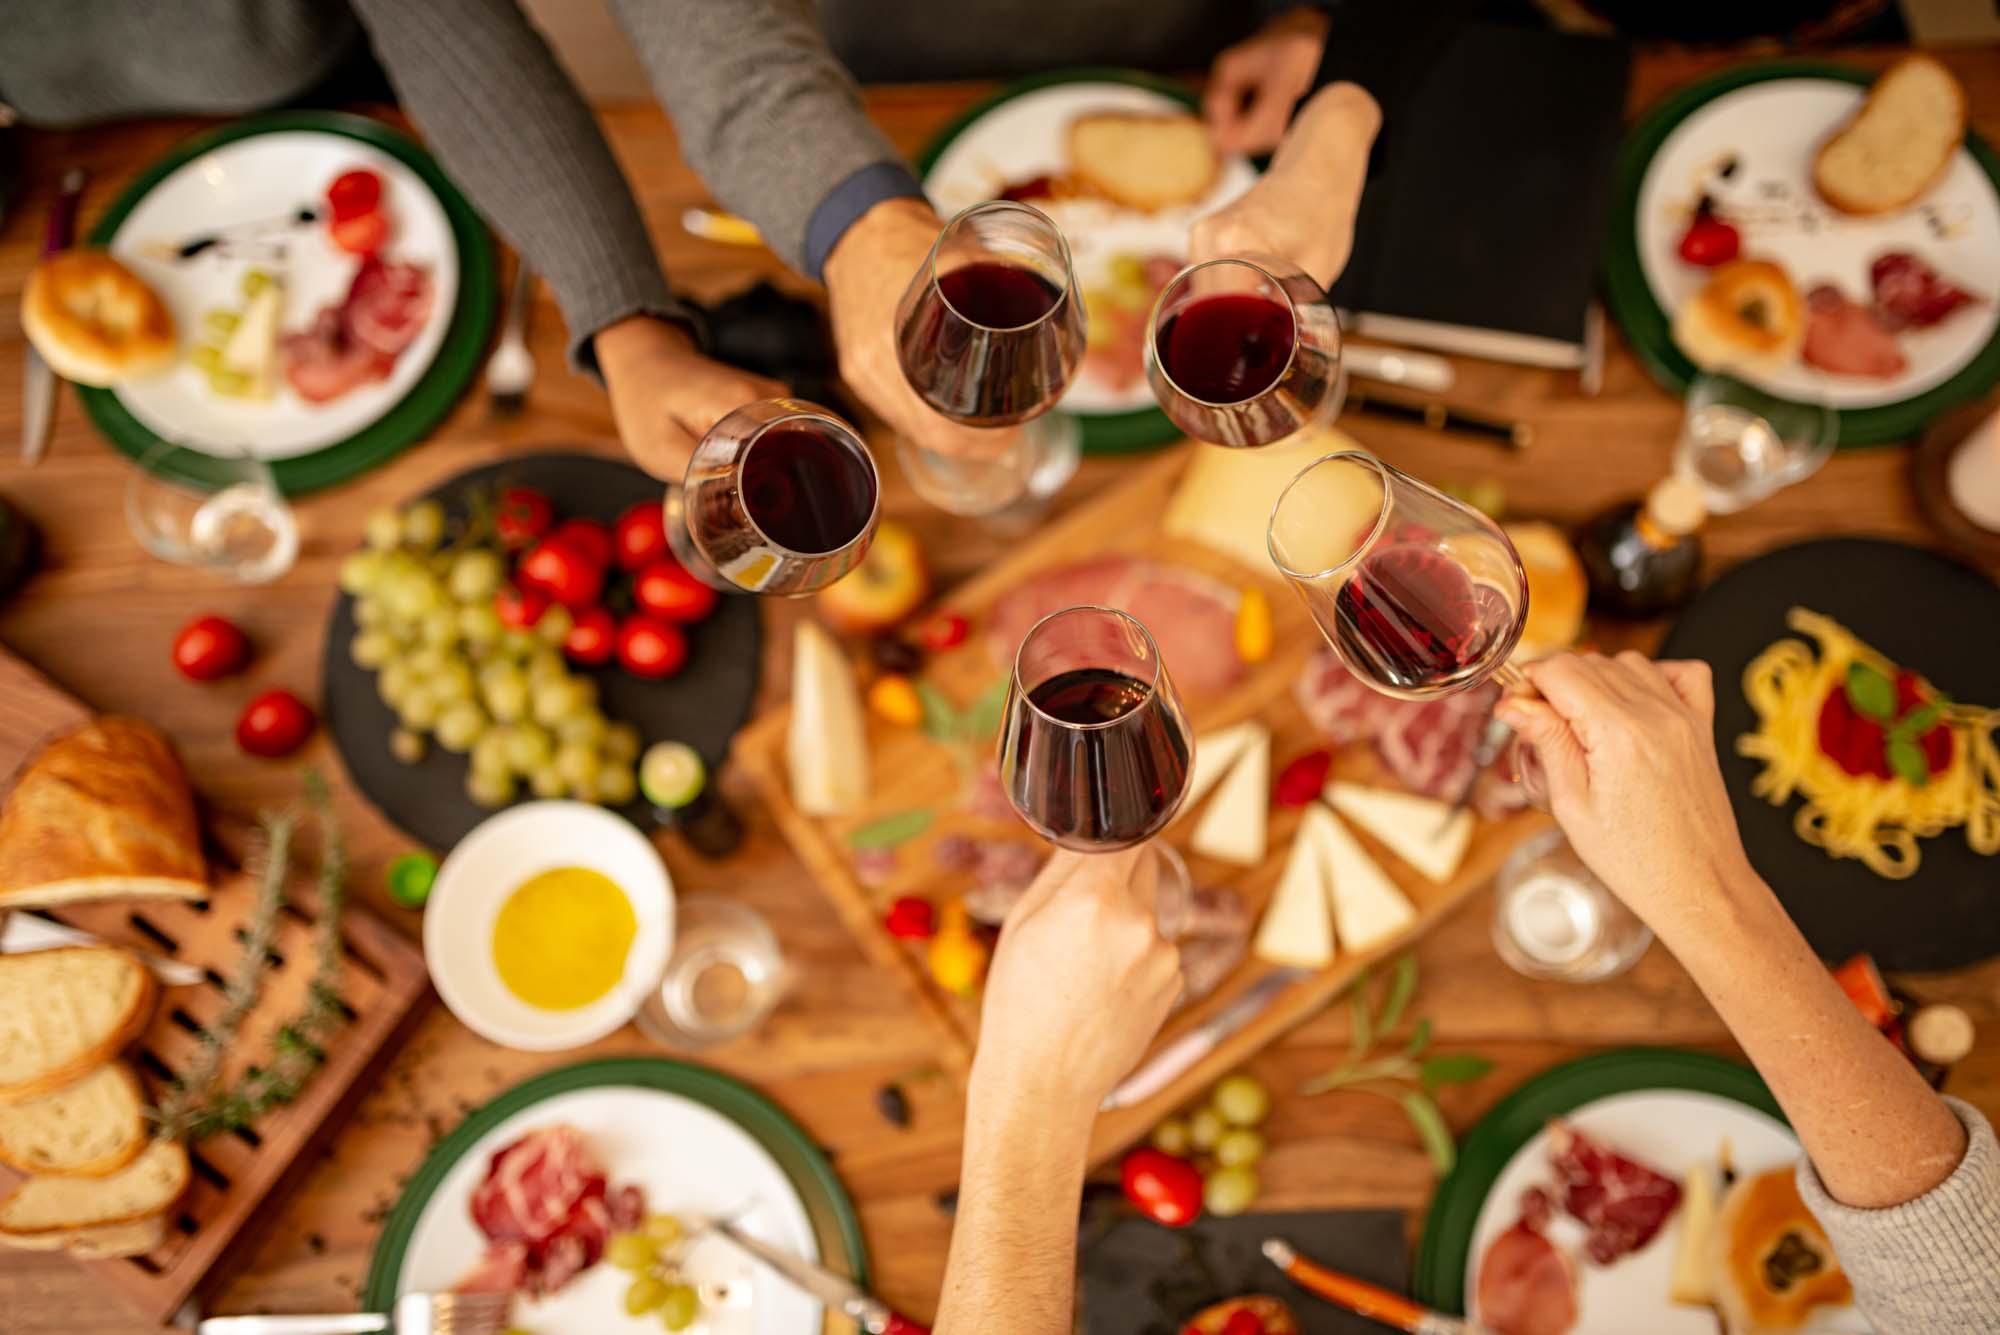 Cucina Amatoriale Formazione Manageriale a Palermo